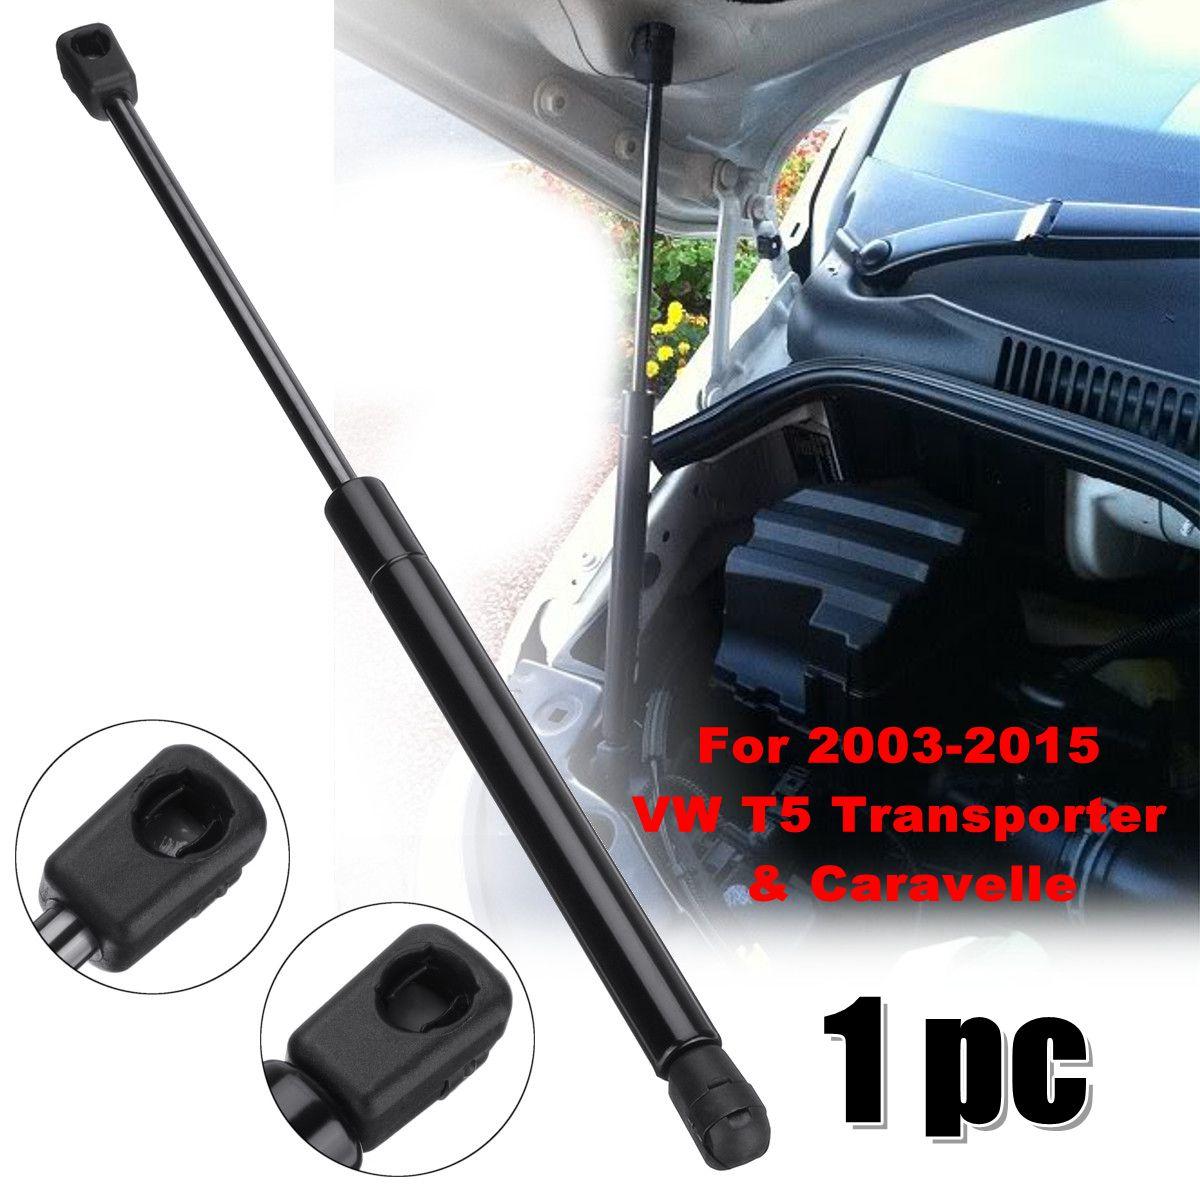 цена на 1Pc Front Bonnet Hood Support Gas Strut For VW T5 Transporter & Caravelle 2003-2015 7E0823359